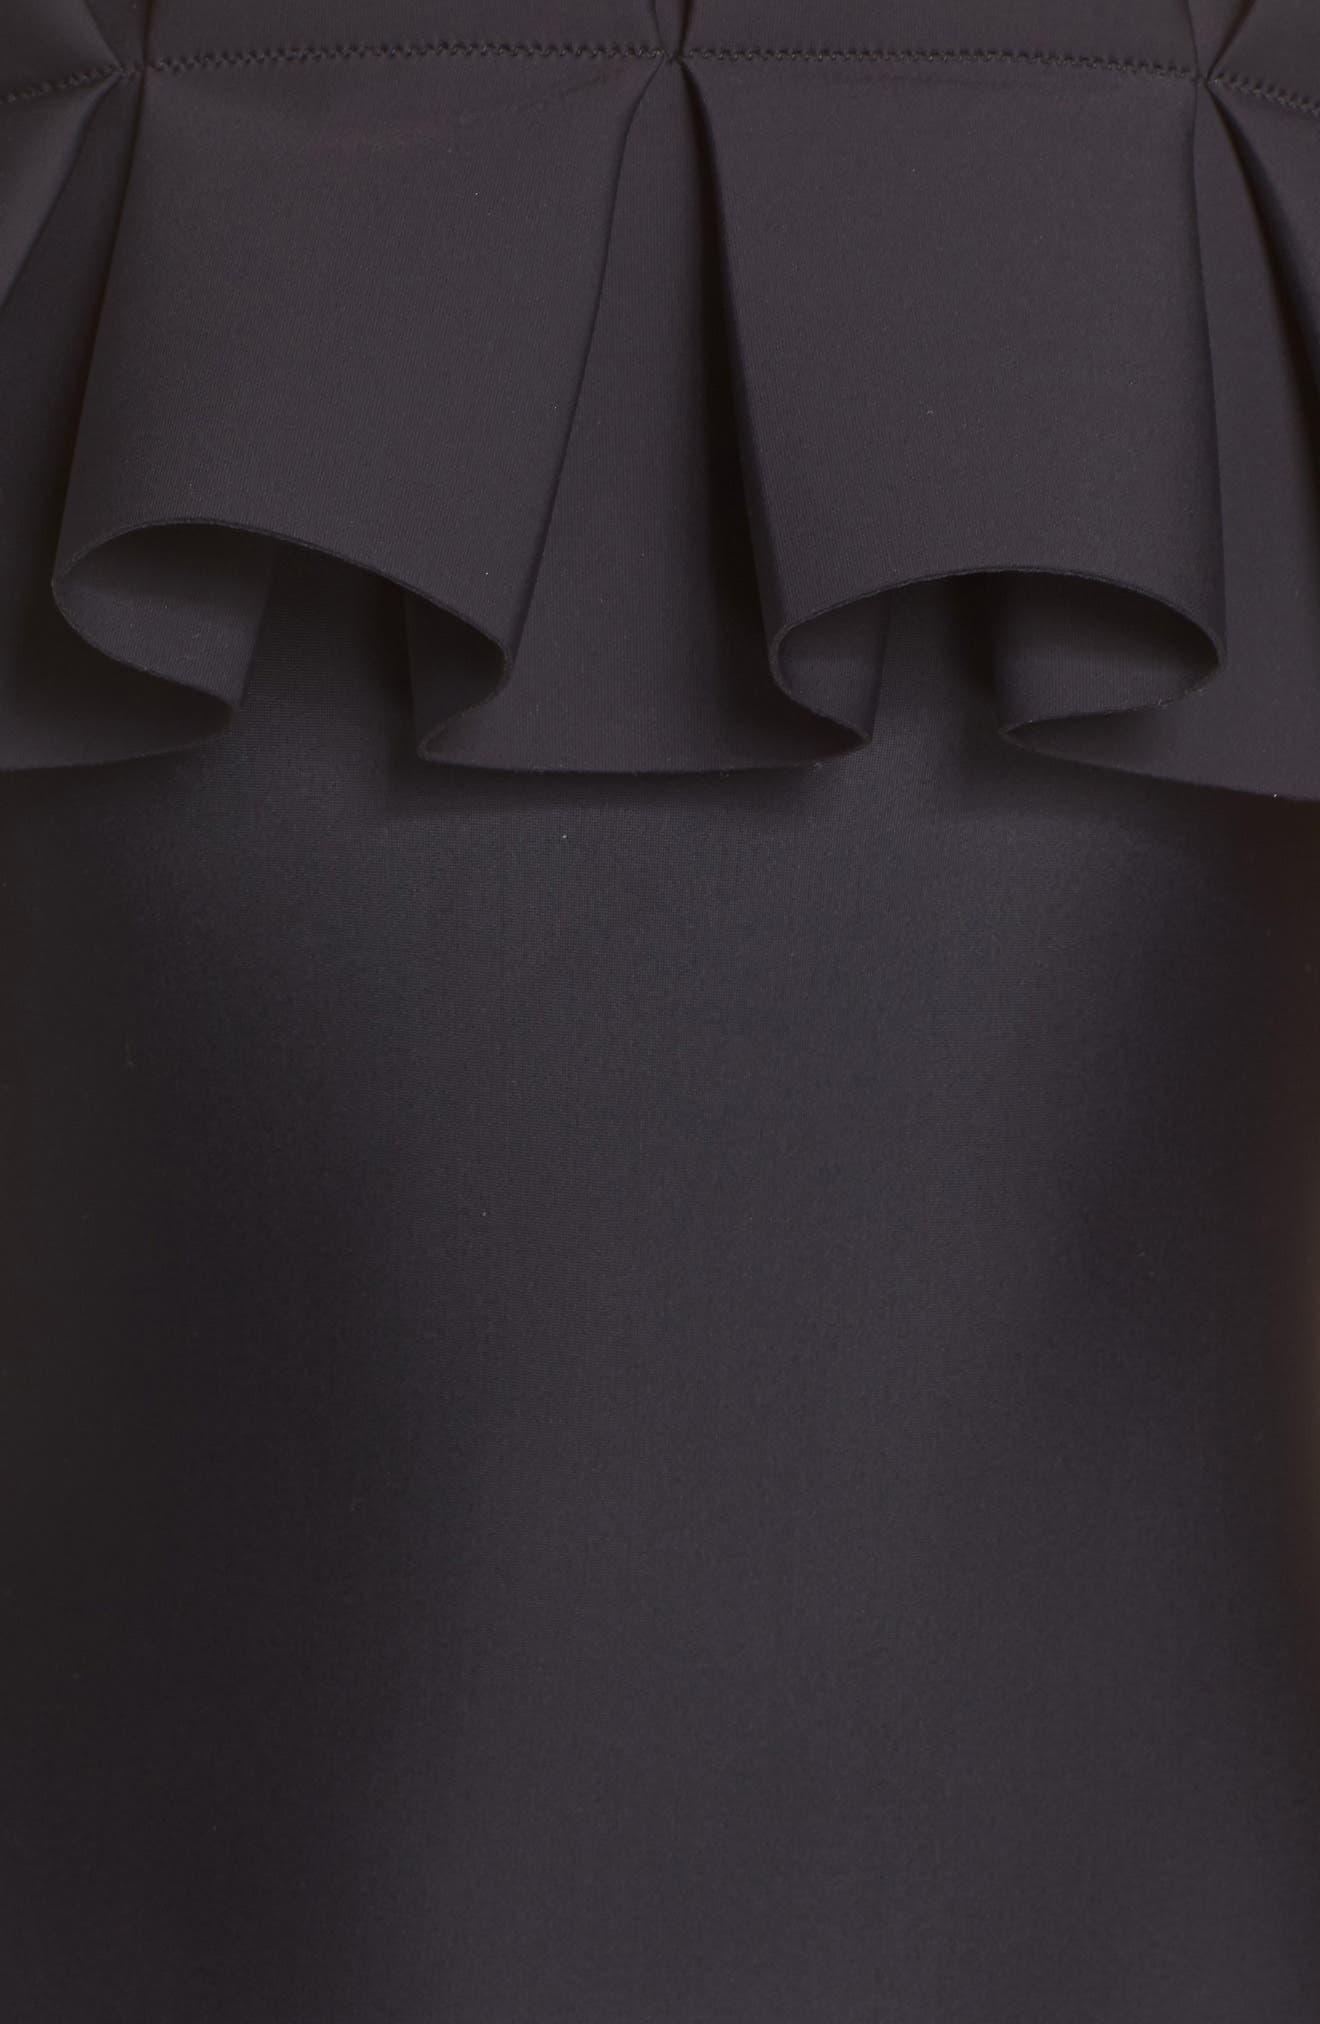 Solmina Box Pleated Bardot One-Piece Swimsuit,                             Alternate thumbnail 5, color,                             BLACK